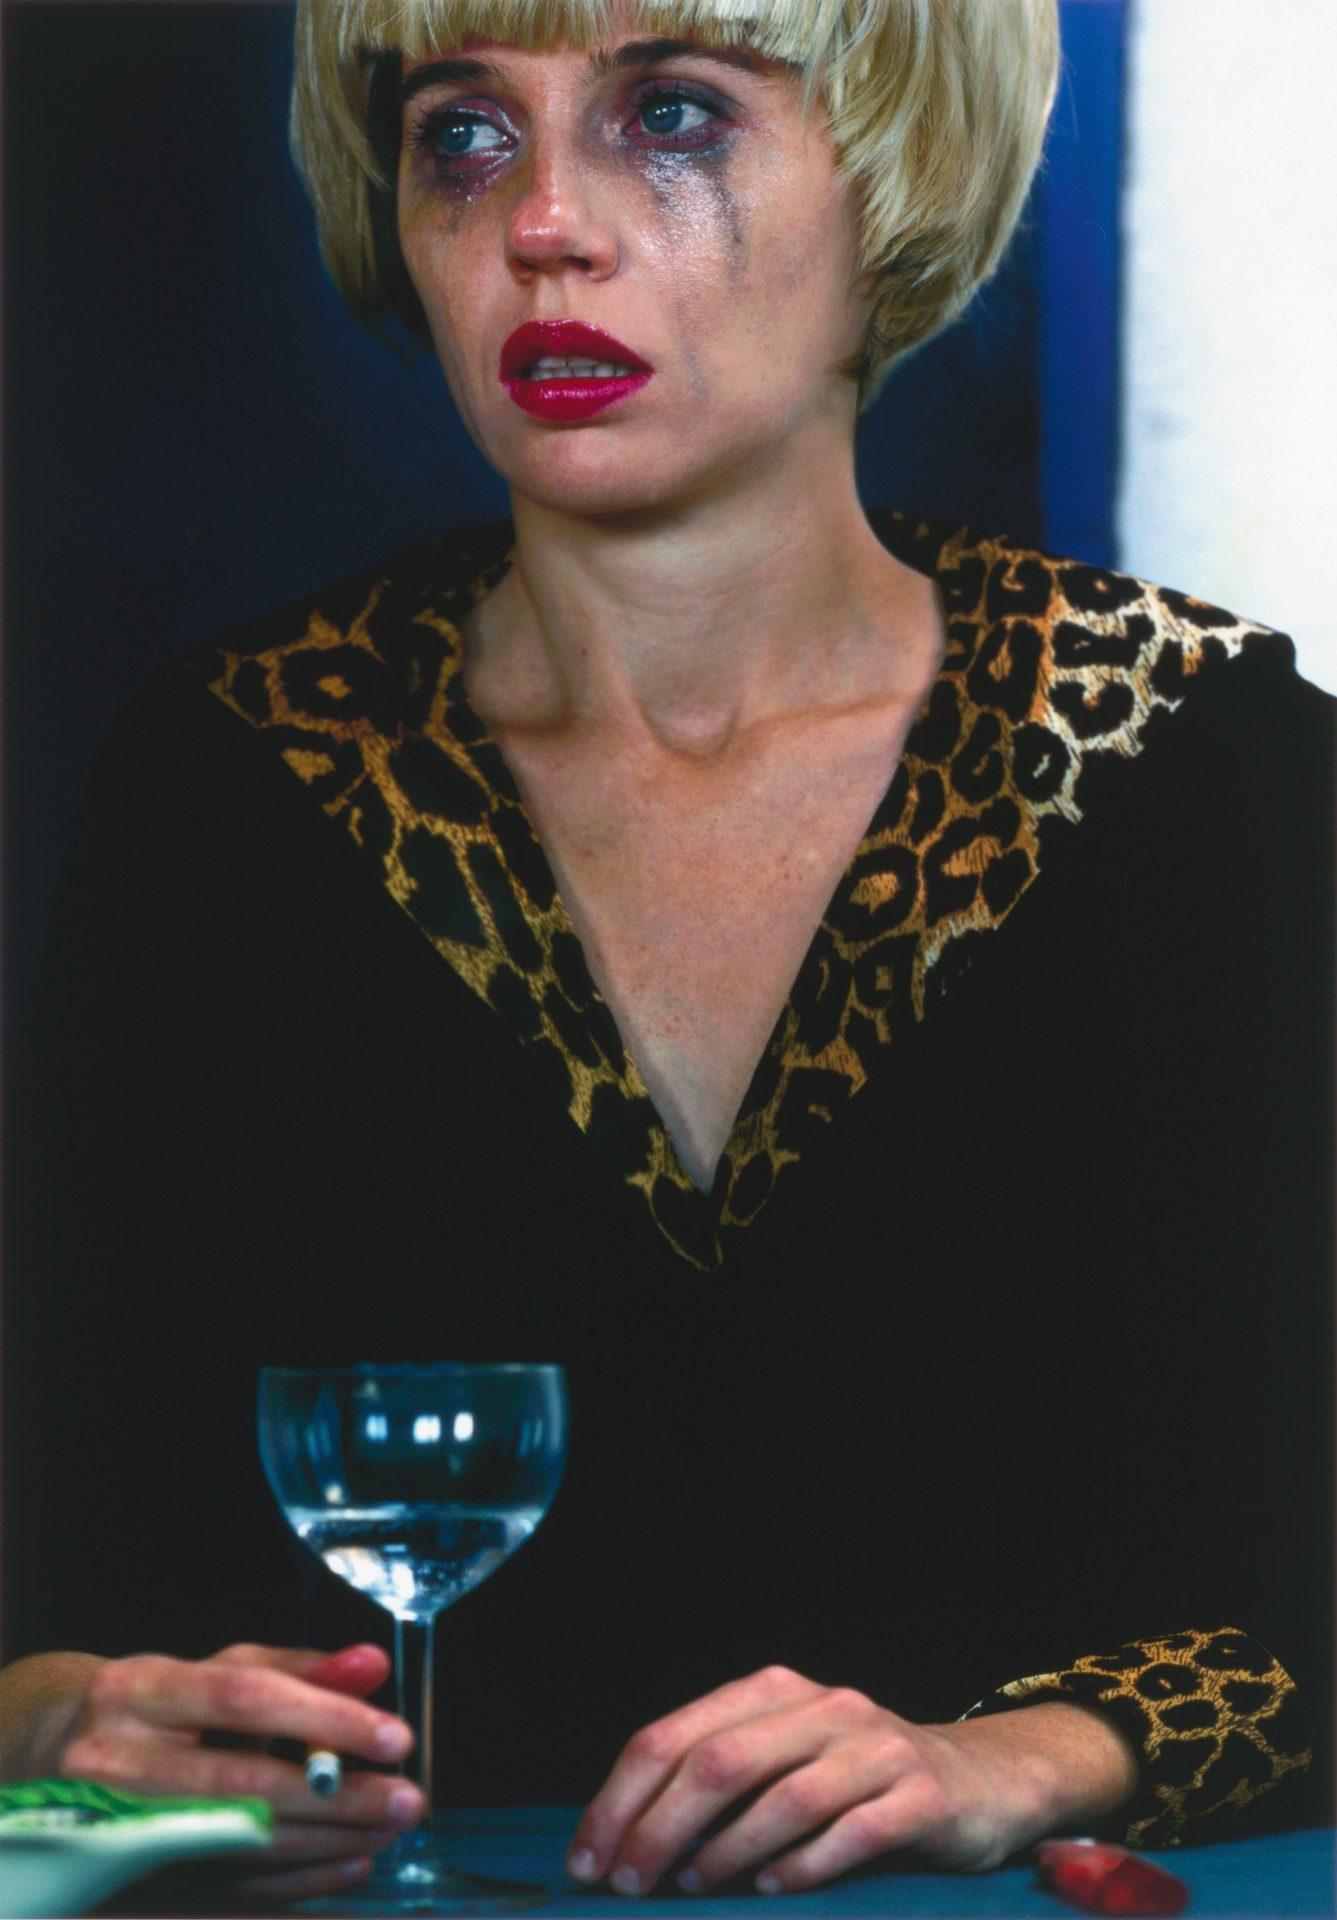 Aneta Grzeszykowska, Untitled Film Stills #27, 2006